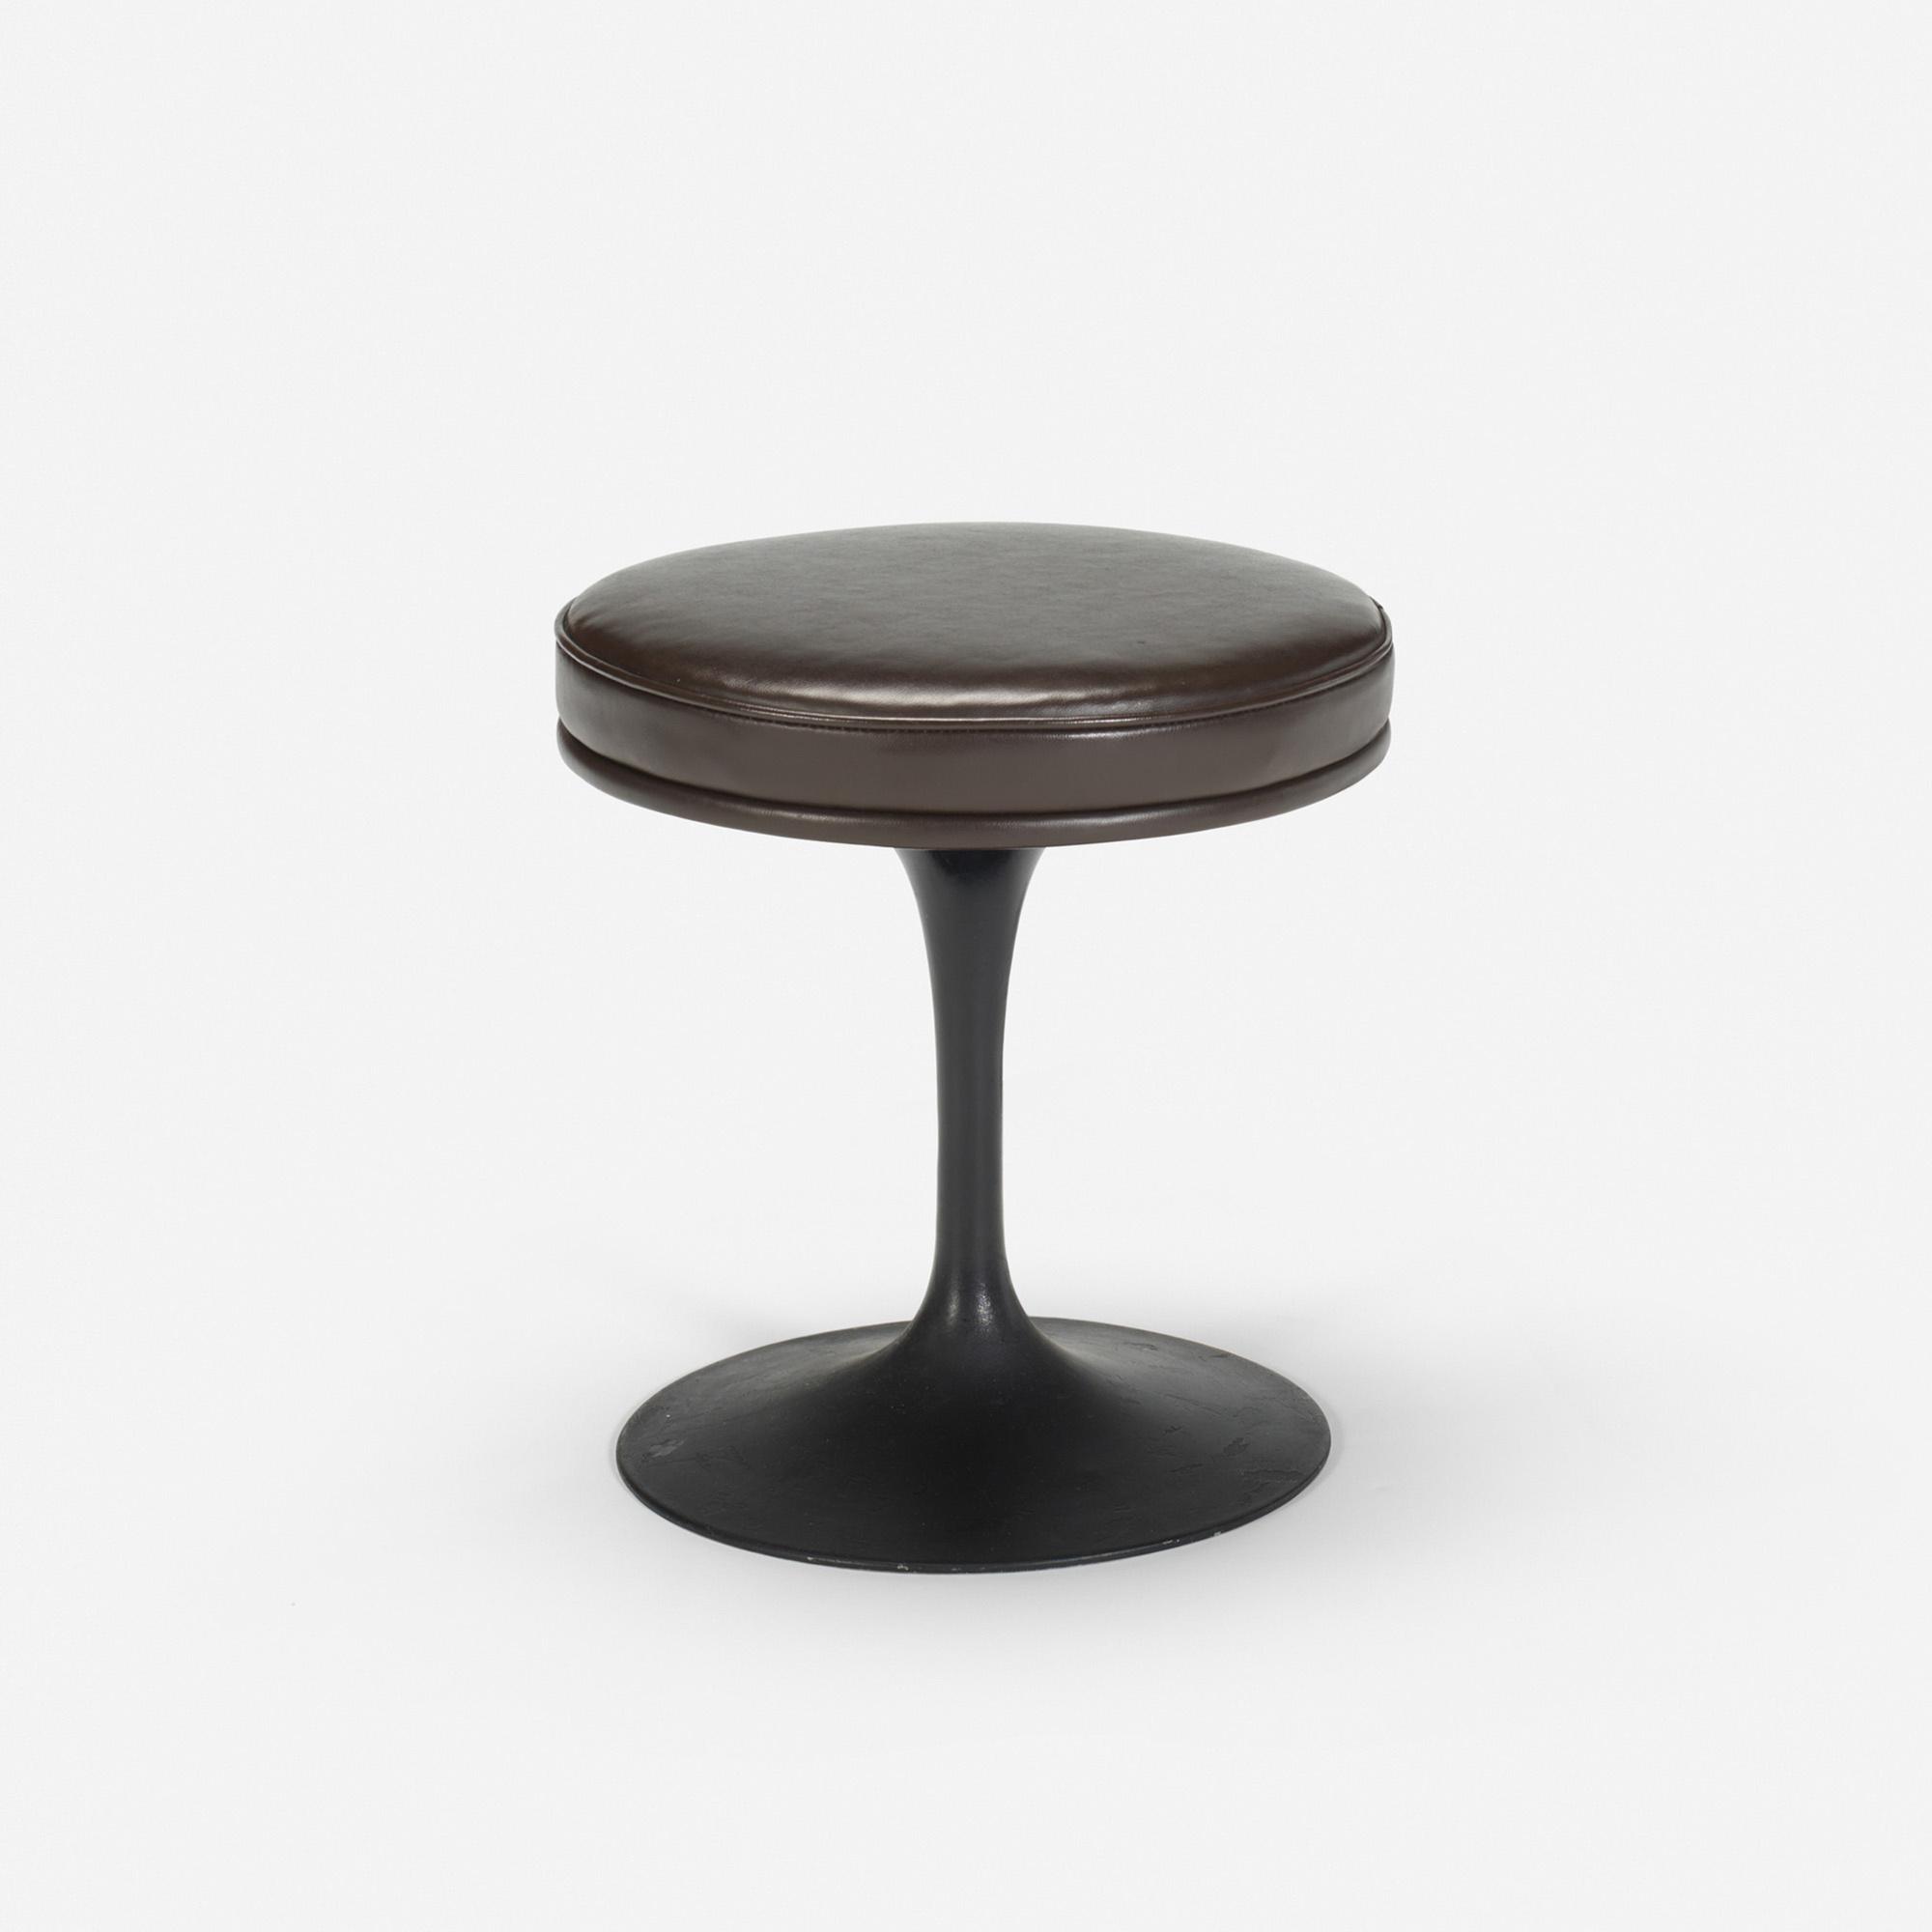 129: Eero Saarinen / Tulip stool from the bar of the Grill Room (1 of 1)